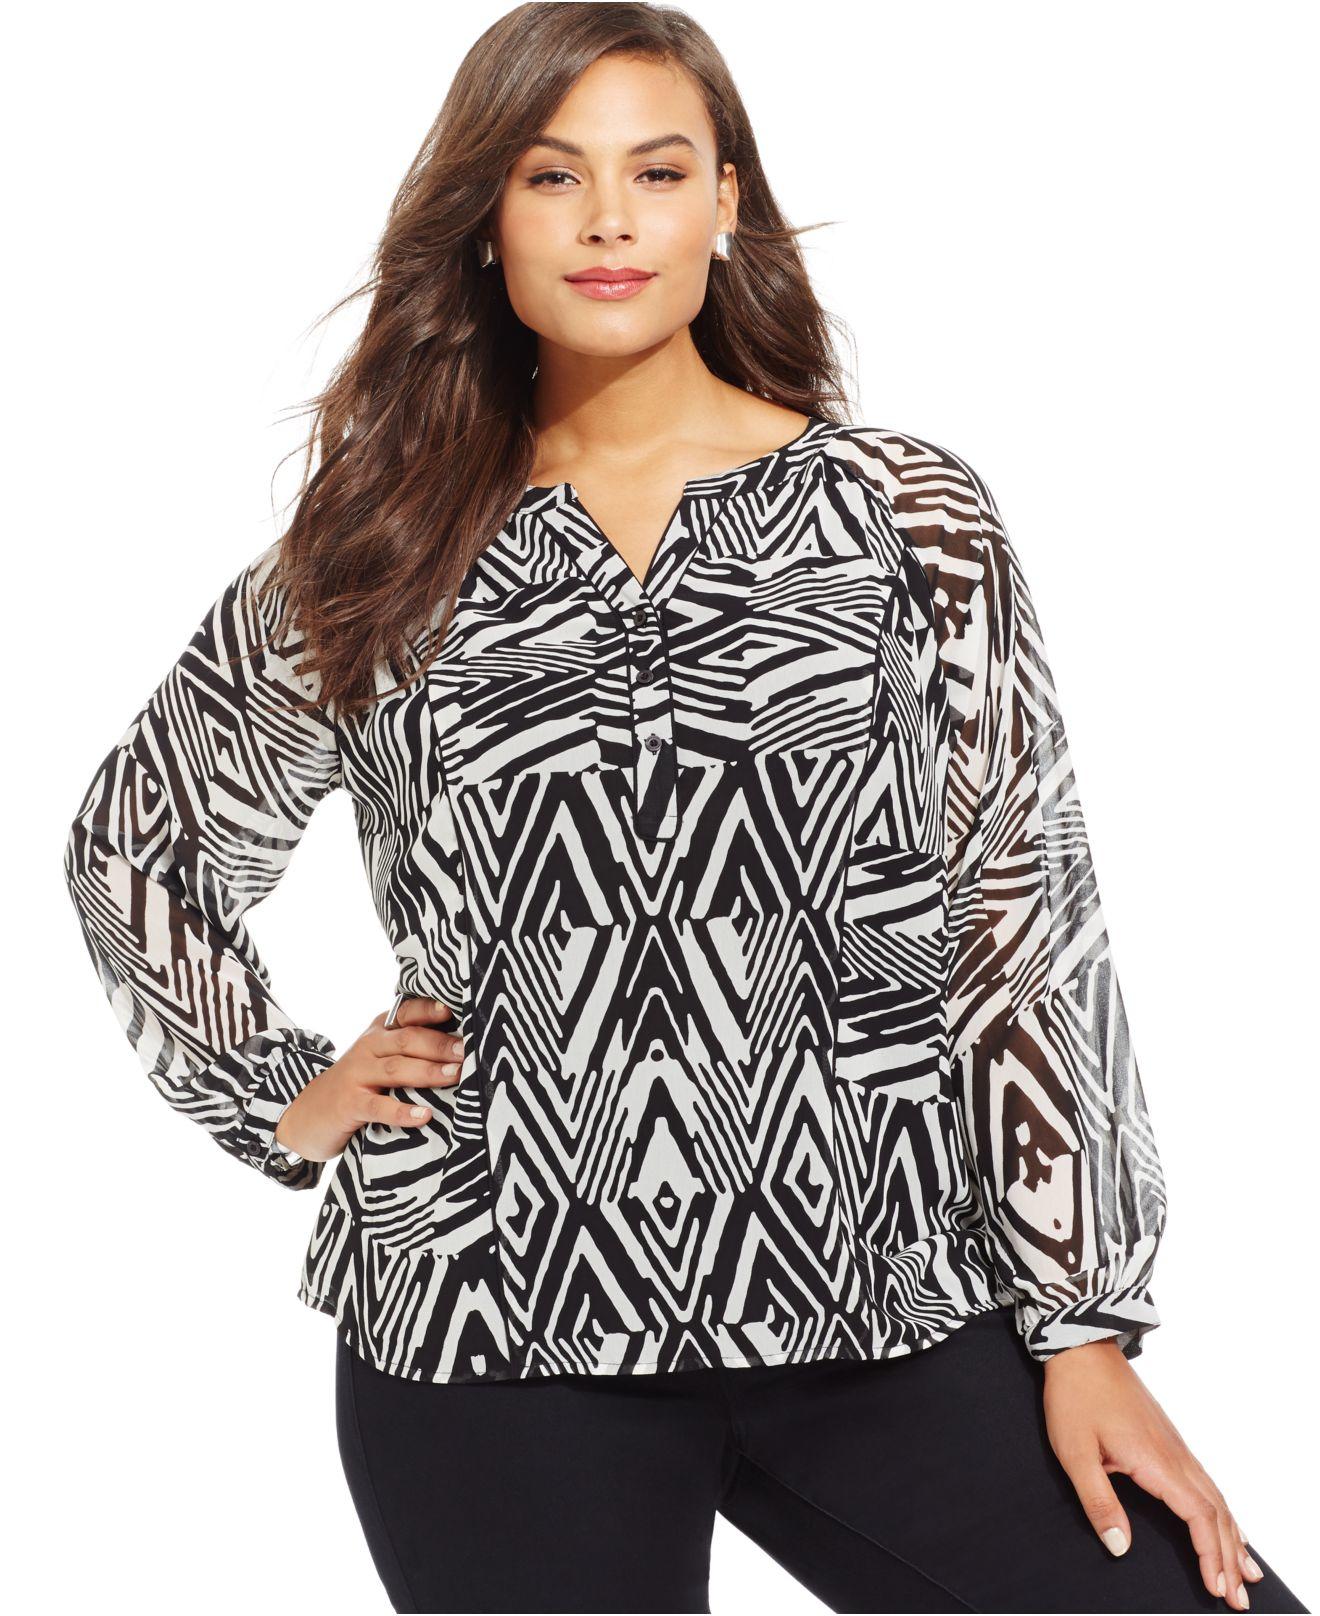 d712c143146 Lyst - Calvin Klein Plus Size Printed Peasant Blouse in Black